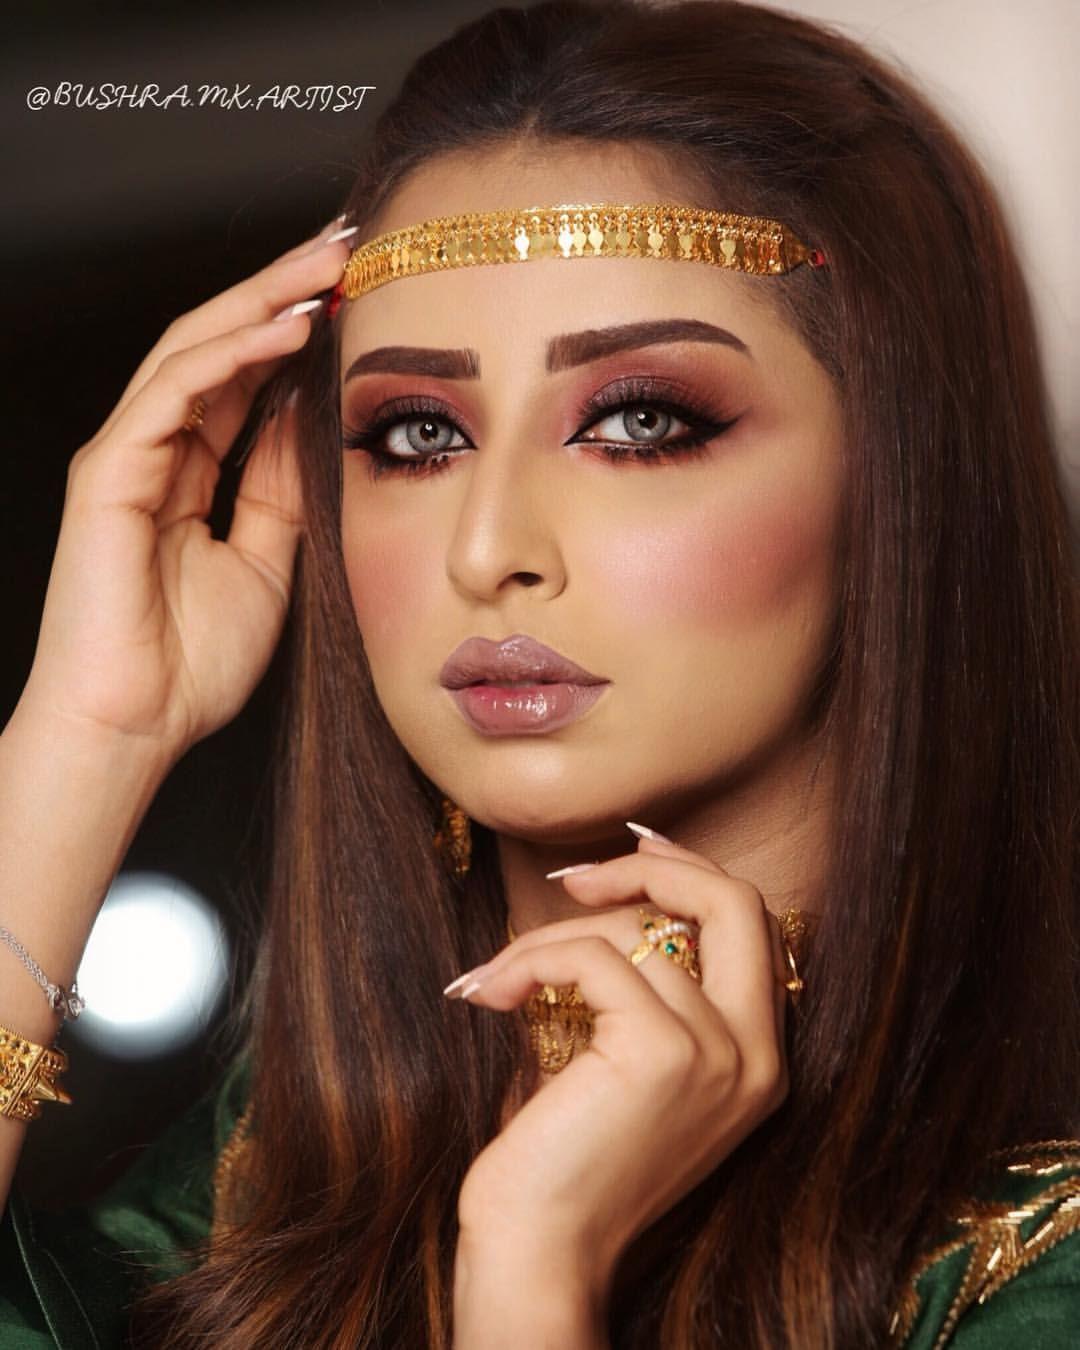 Pin By Nada On Makeup Beauty Women Makeup Goals Makeup